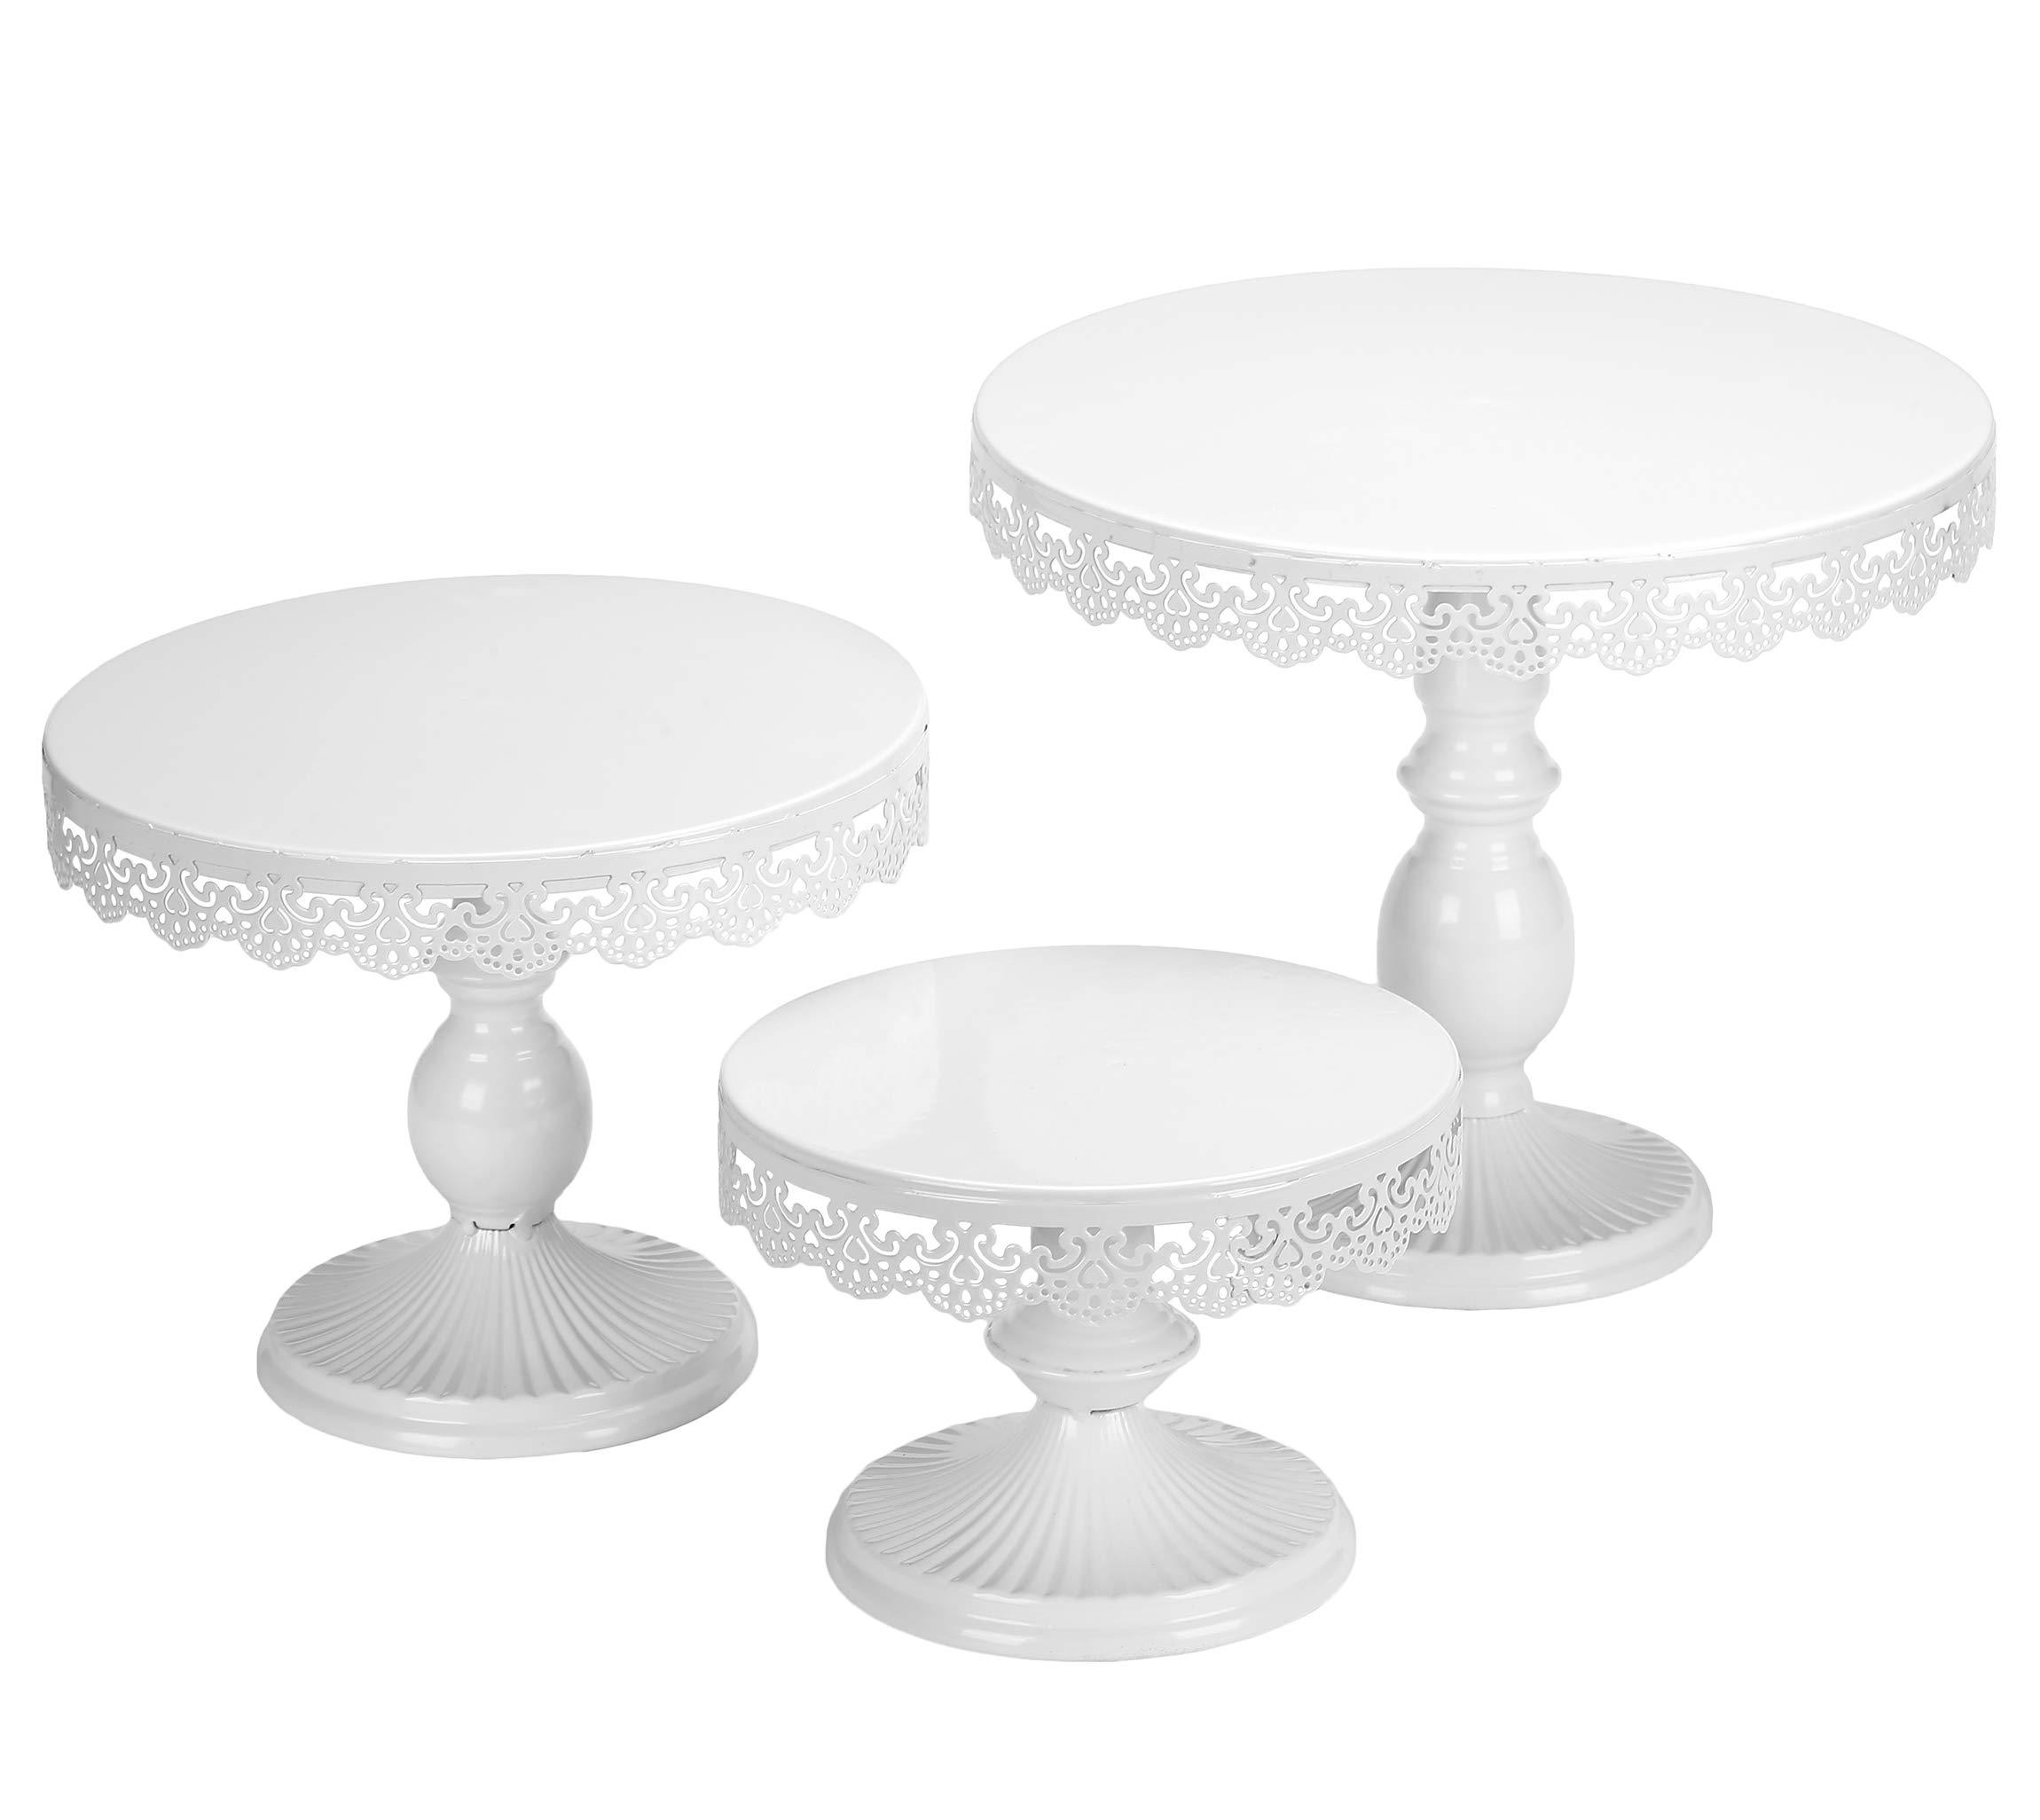 VILAVITA Set of 3 Cake Stands Round Cupcake Stands Metal Dessert Display Cake Stand, White by VILAVITA